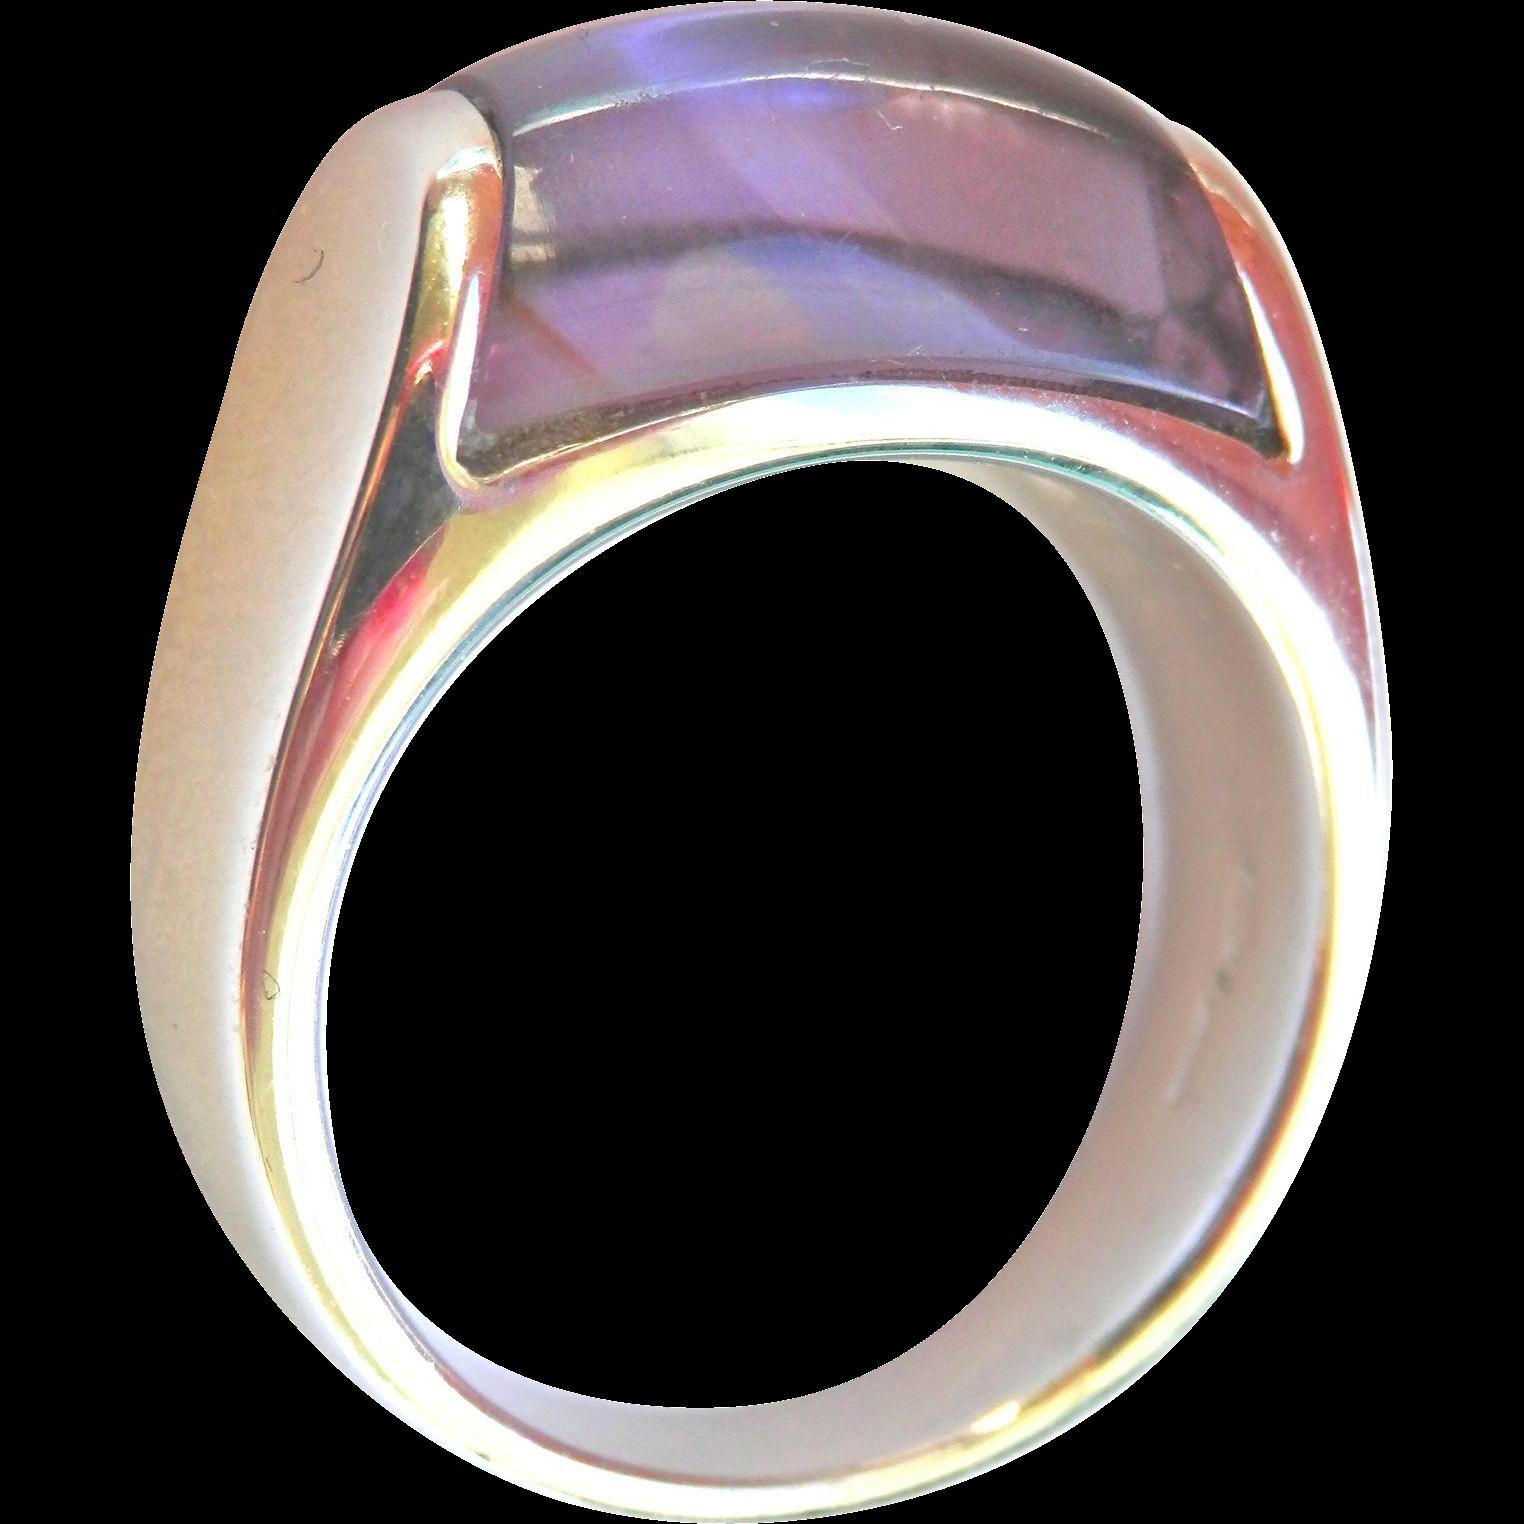 Gorgeous 18K WG Authentic Bvlgari Tronchetto Amethyst Ring